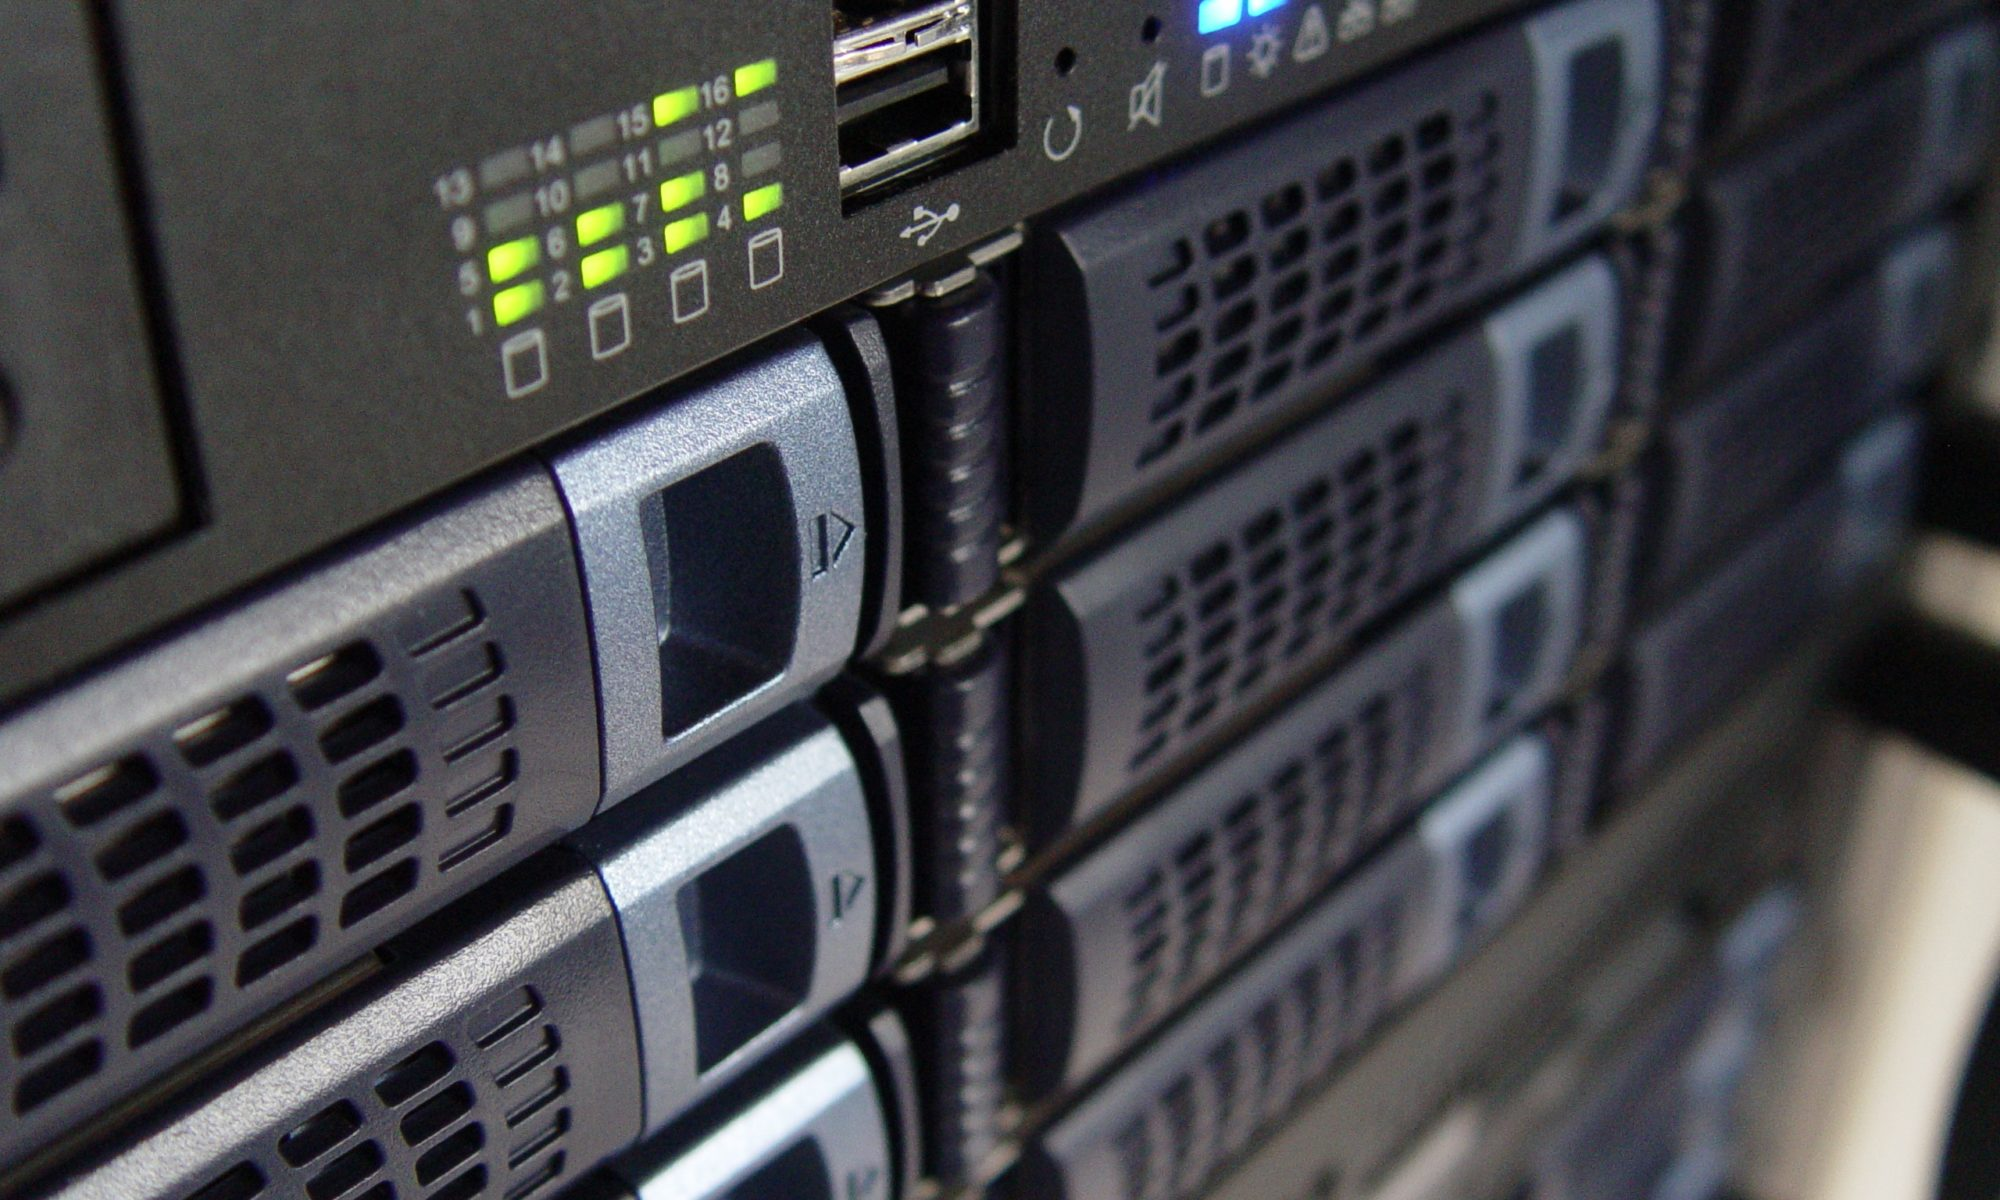 ApSo - správa IT infrastruktury